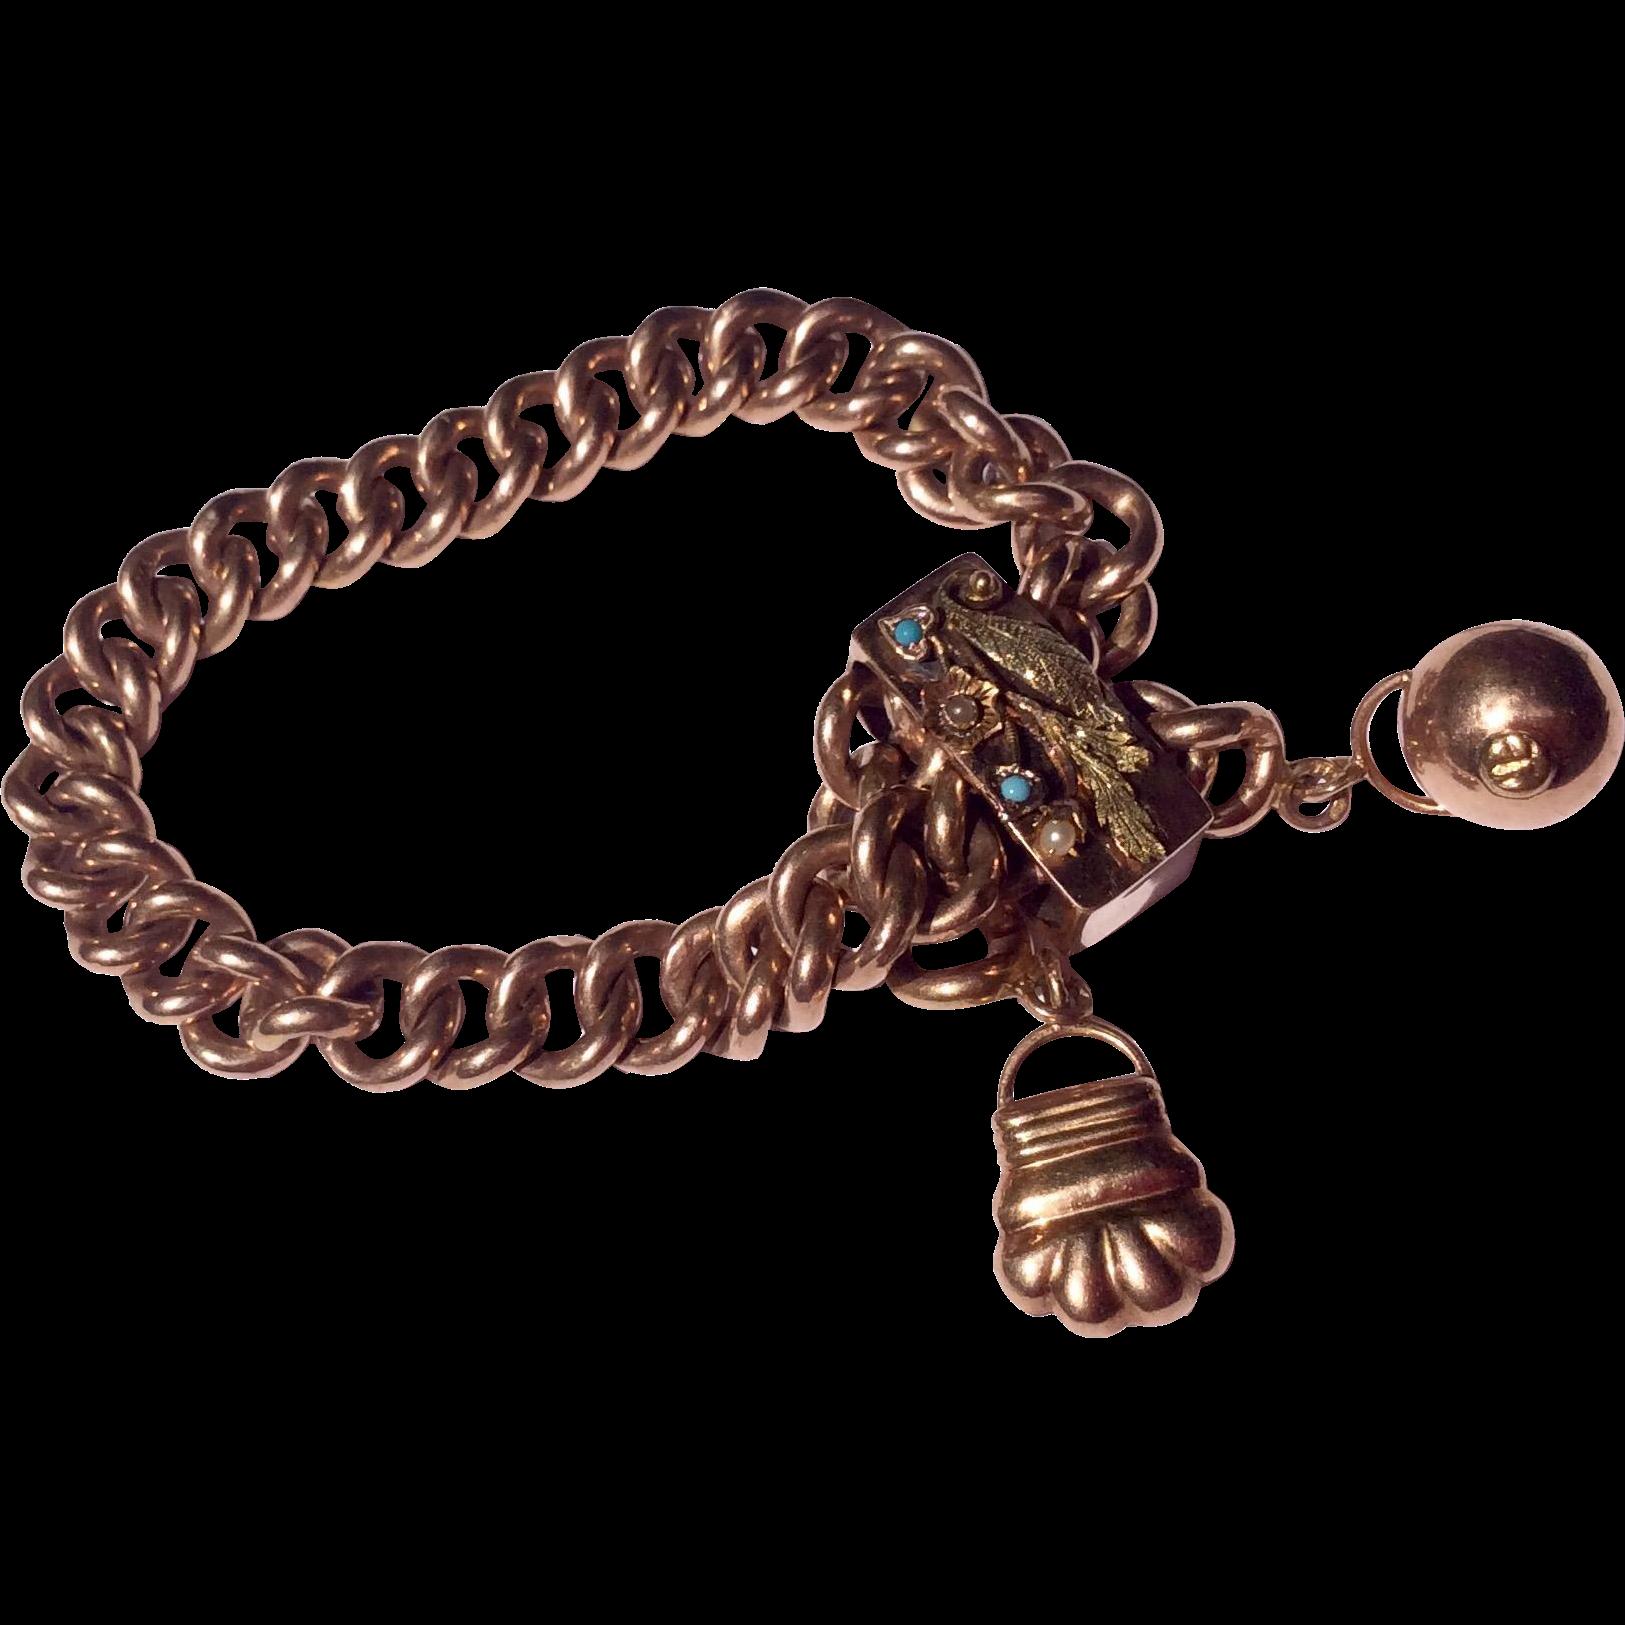 Fabulous Antique Victorian 14 K Gold & Turquoise Large Slide Bracelet